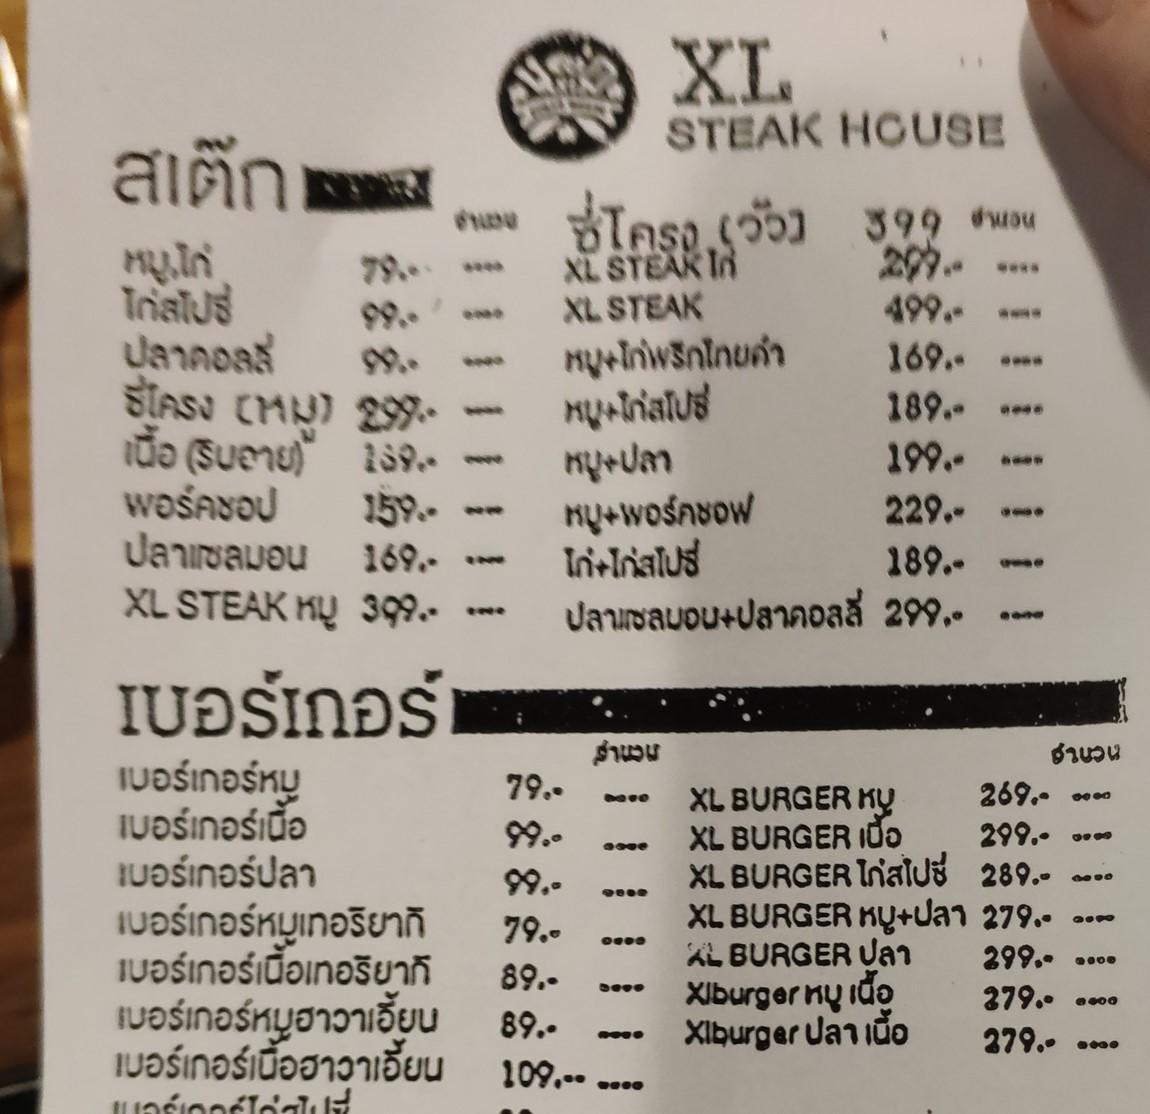 xl-steakhouse-menu-3.jpg